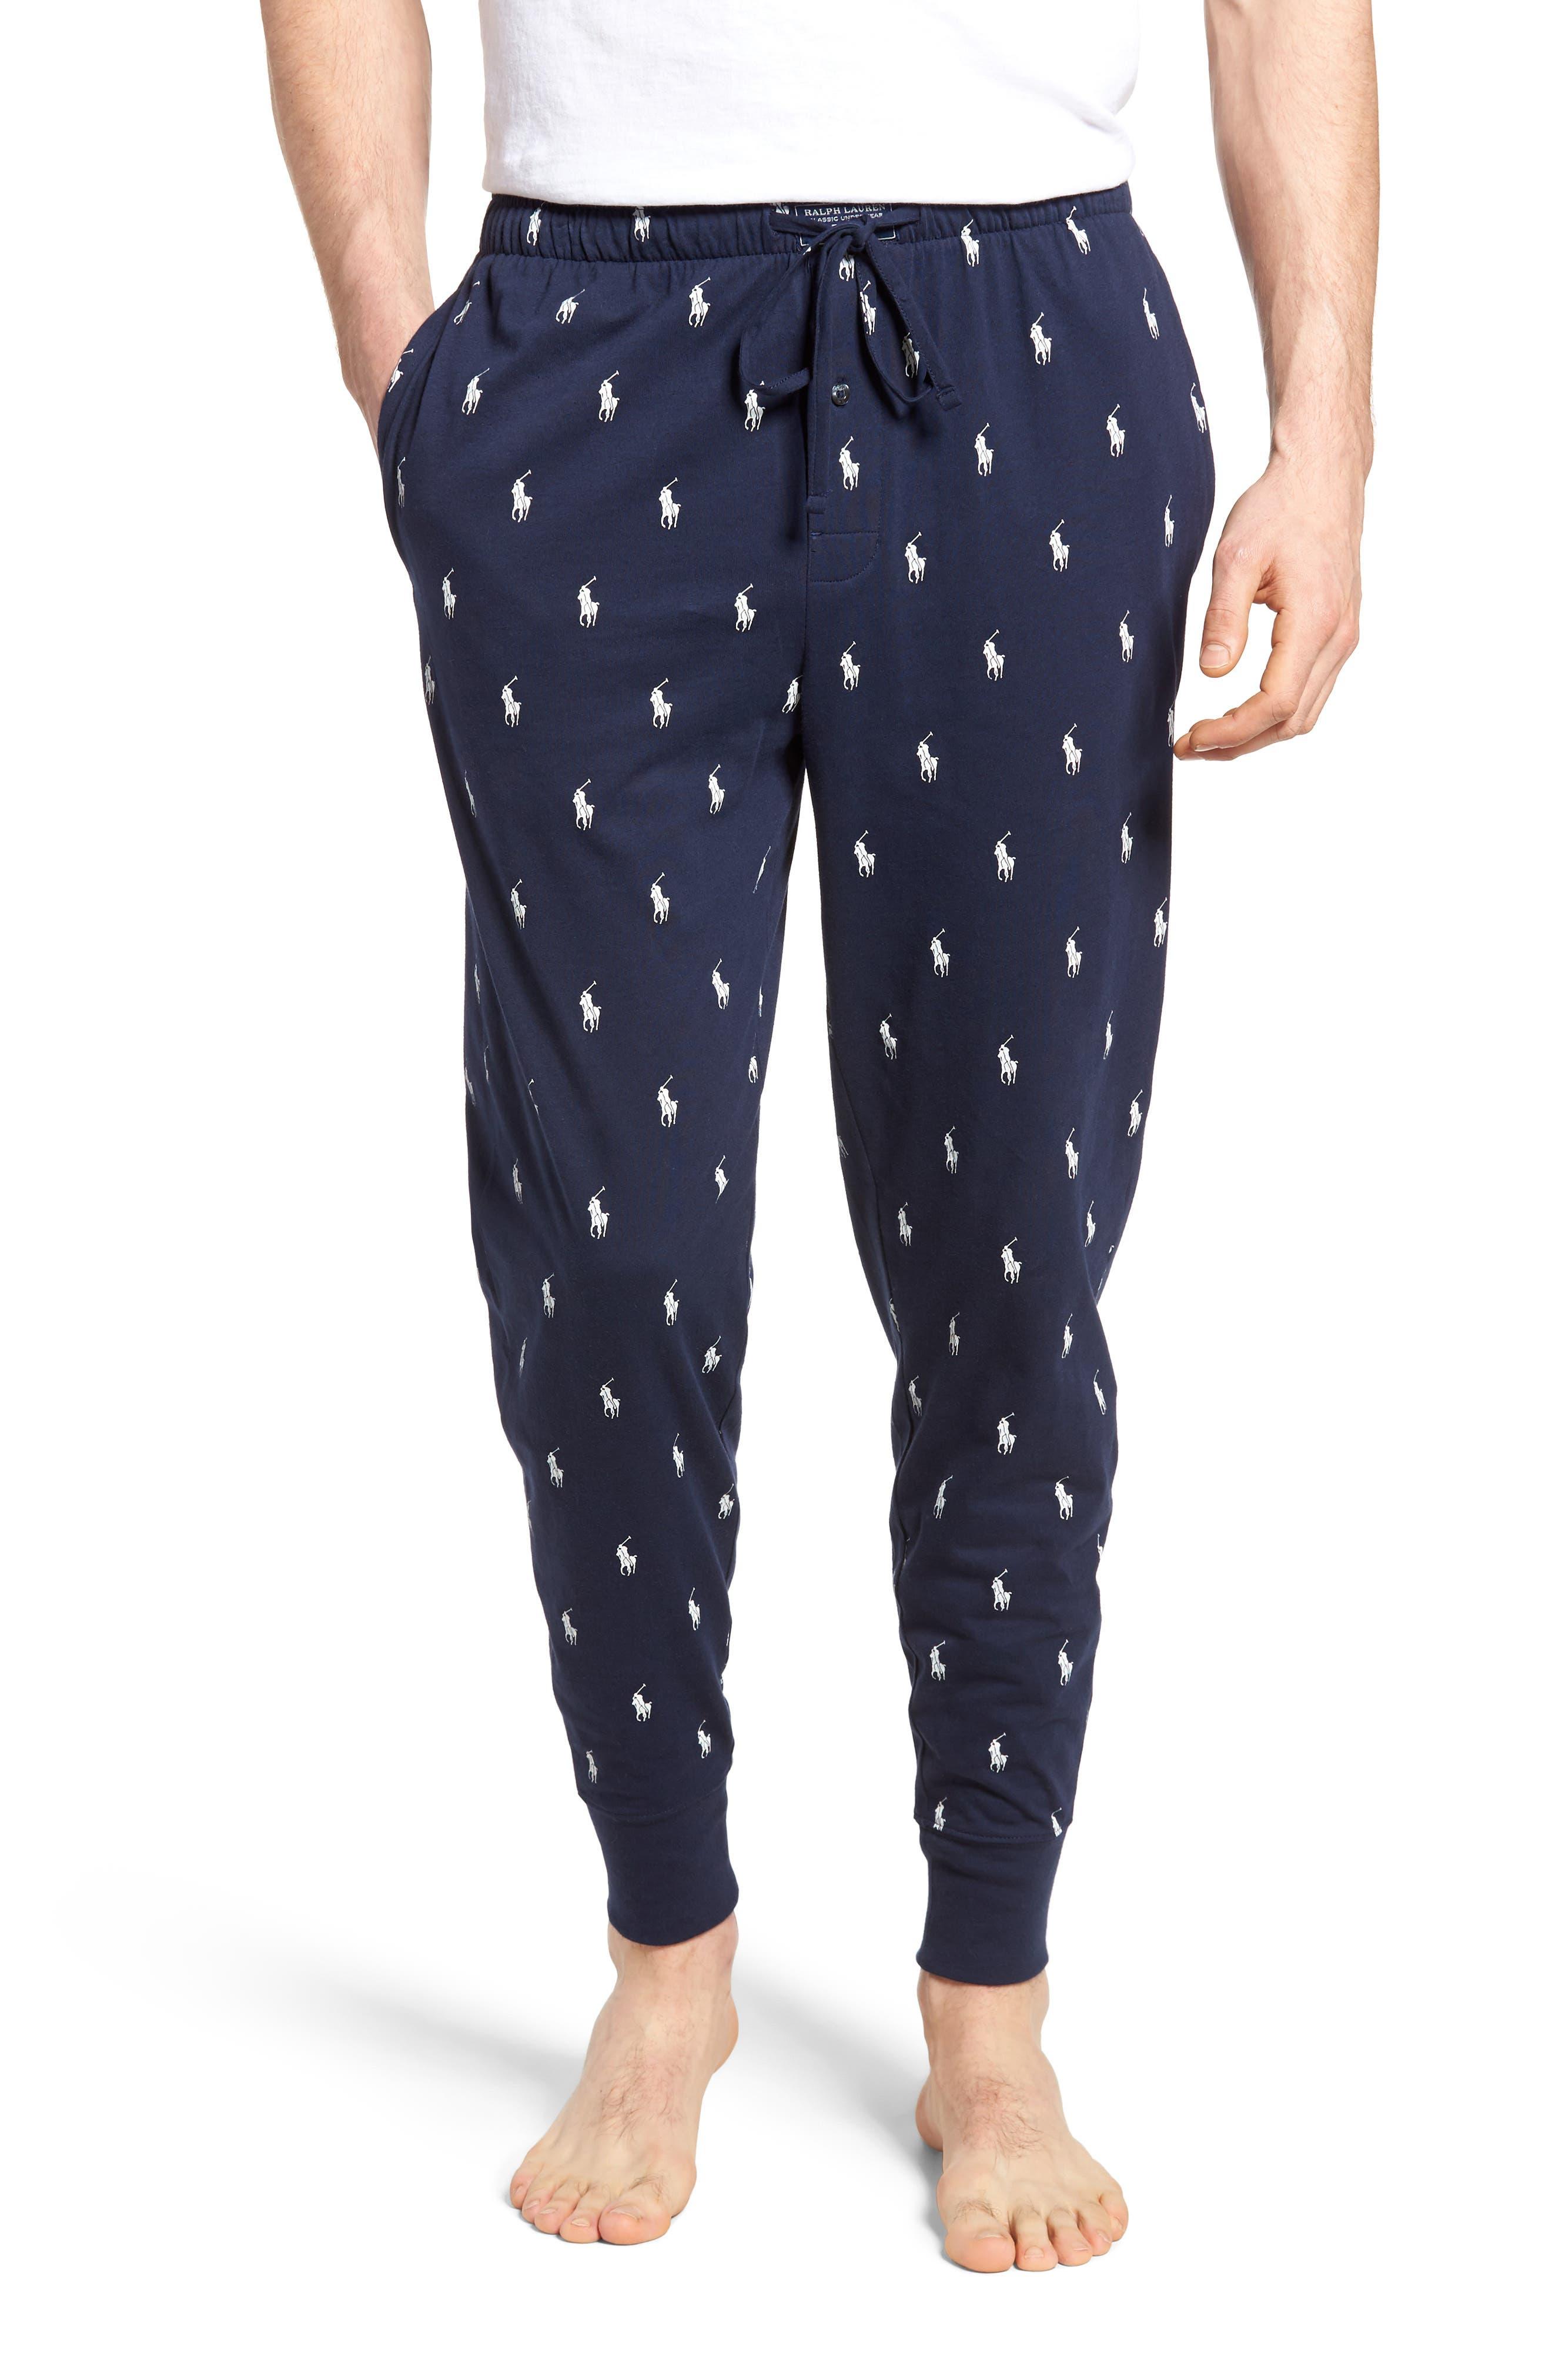 Calvin Klein Woman Printed Jersey Pajama Pants Light Brown Size XS Calvin Klein Visa Payment Cheap Online Sast Online Discount From China Discount High Quality mxzMHkjI6J